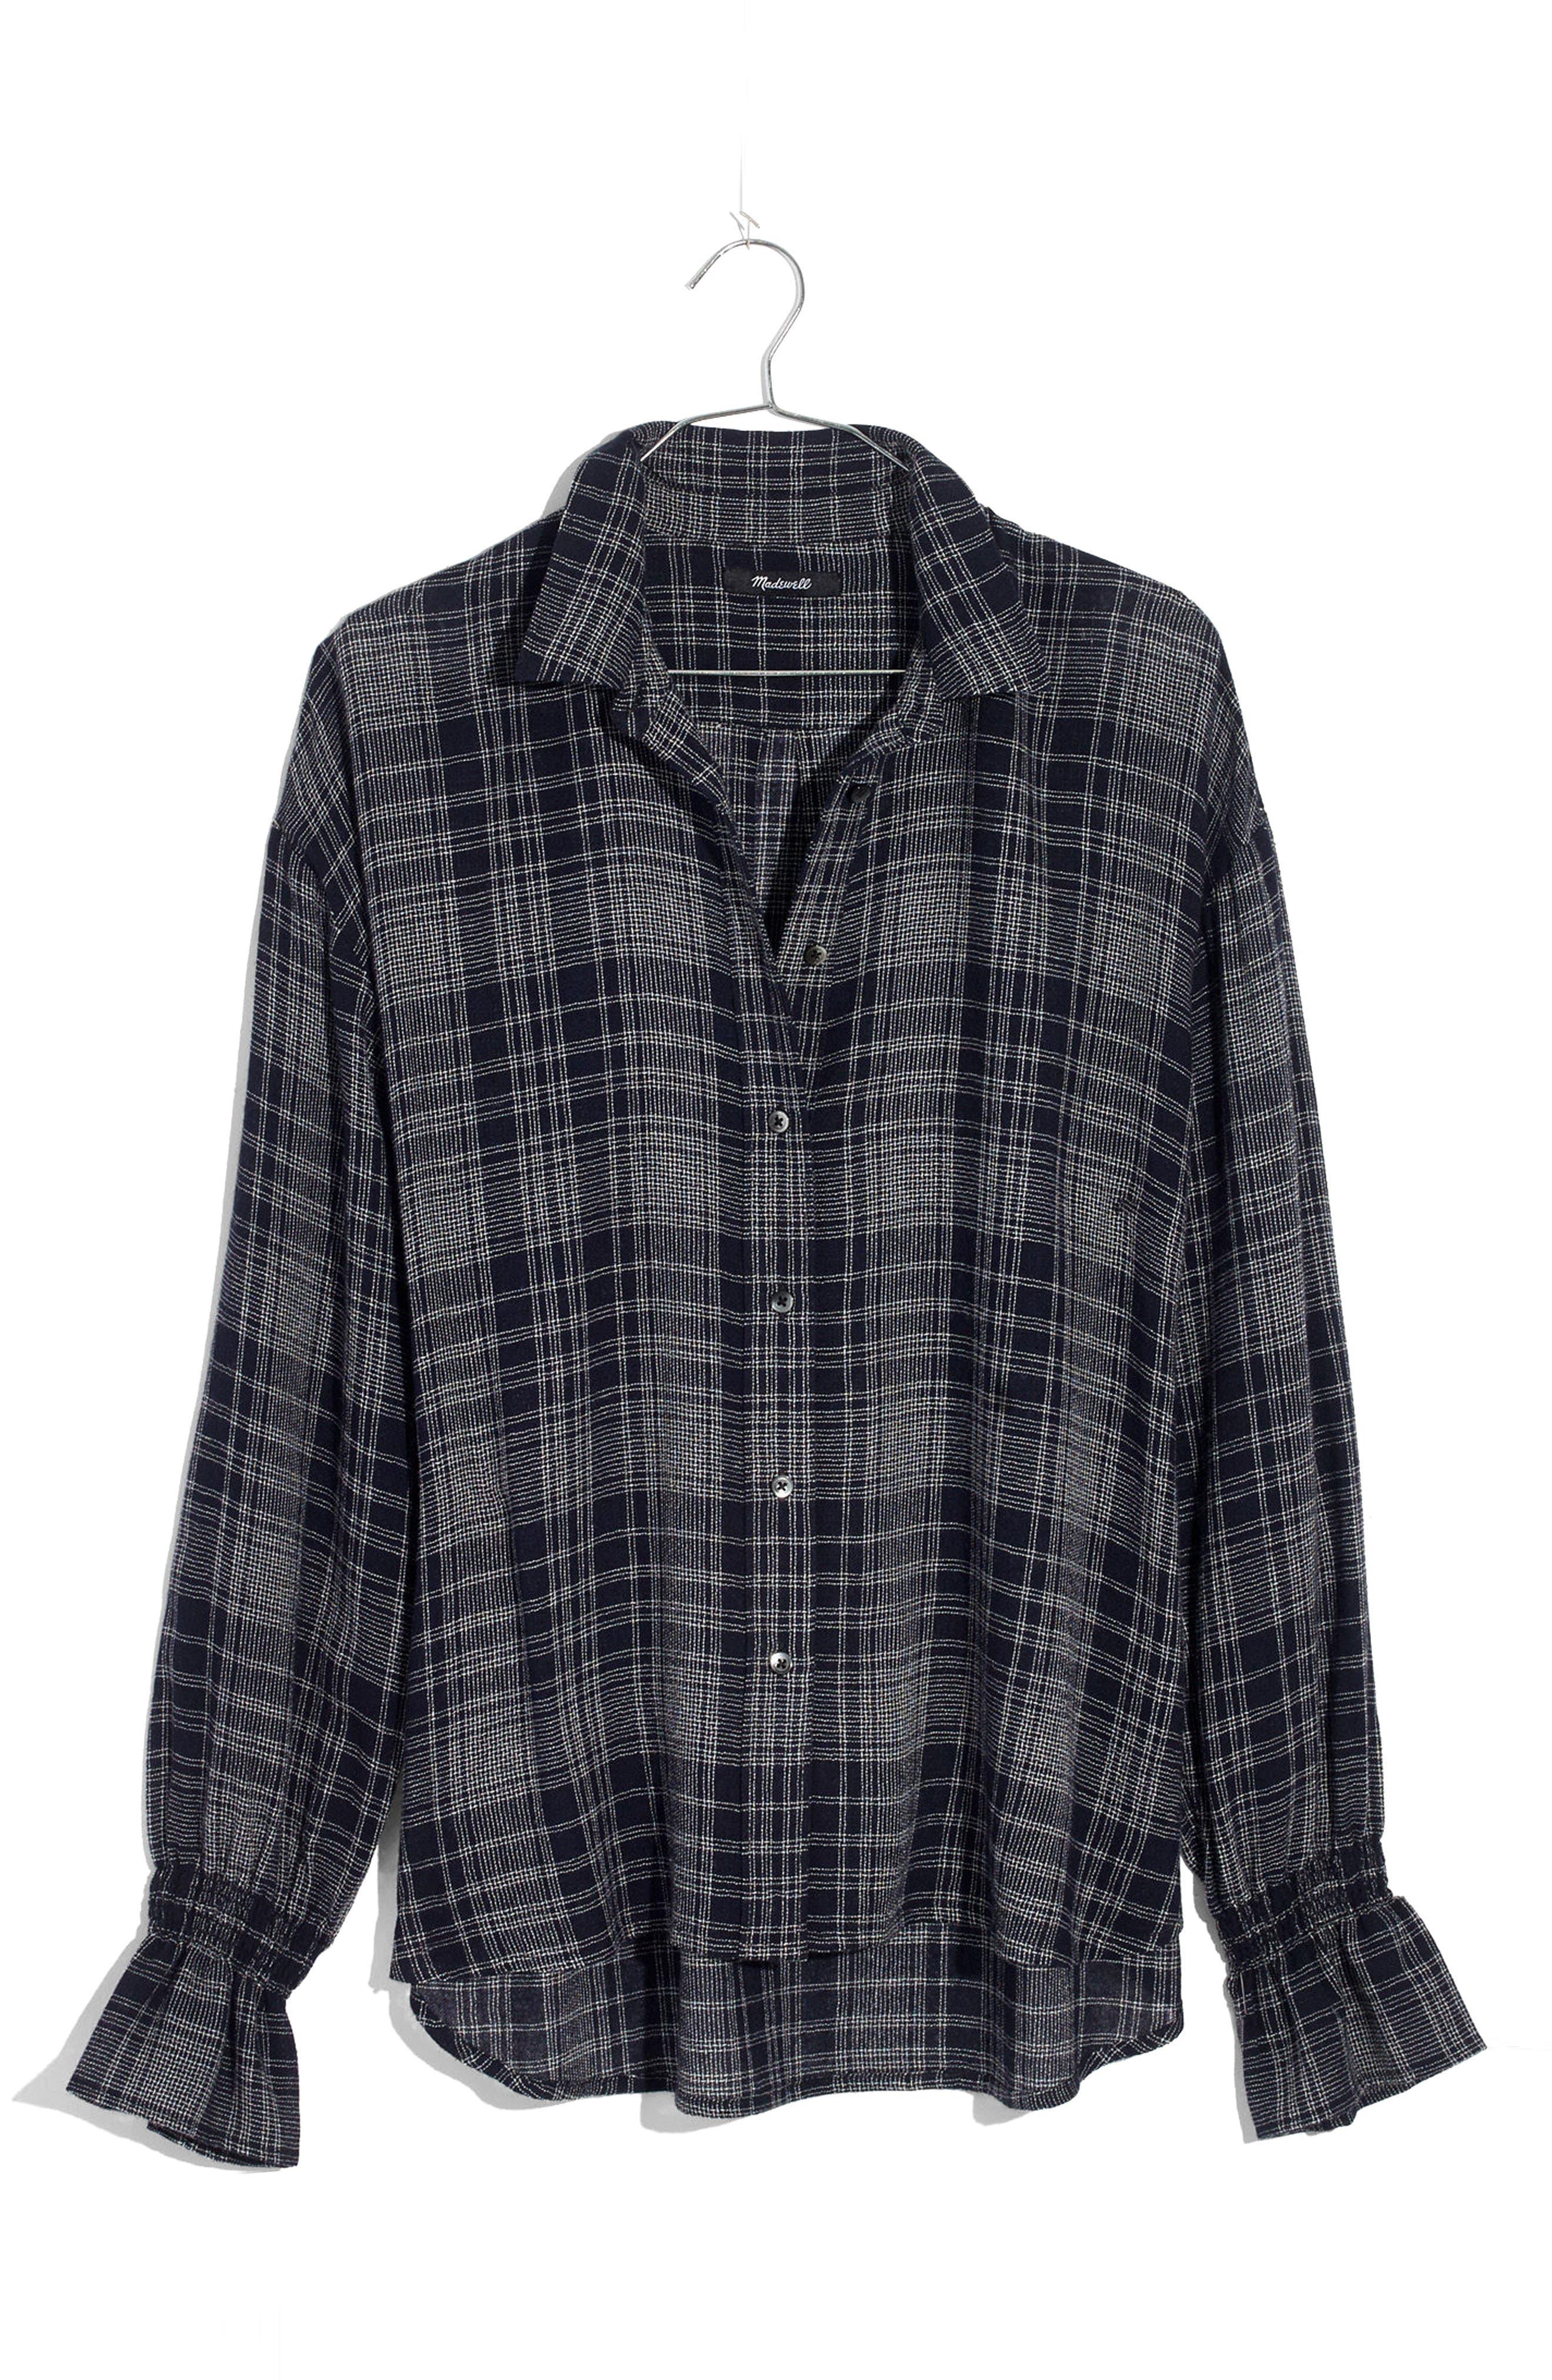 Westward Bell Sleeve Shirt,                             Alternate thumbnail 4, color,                             400